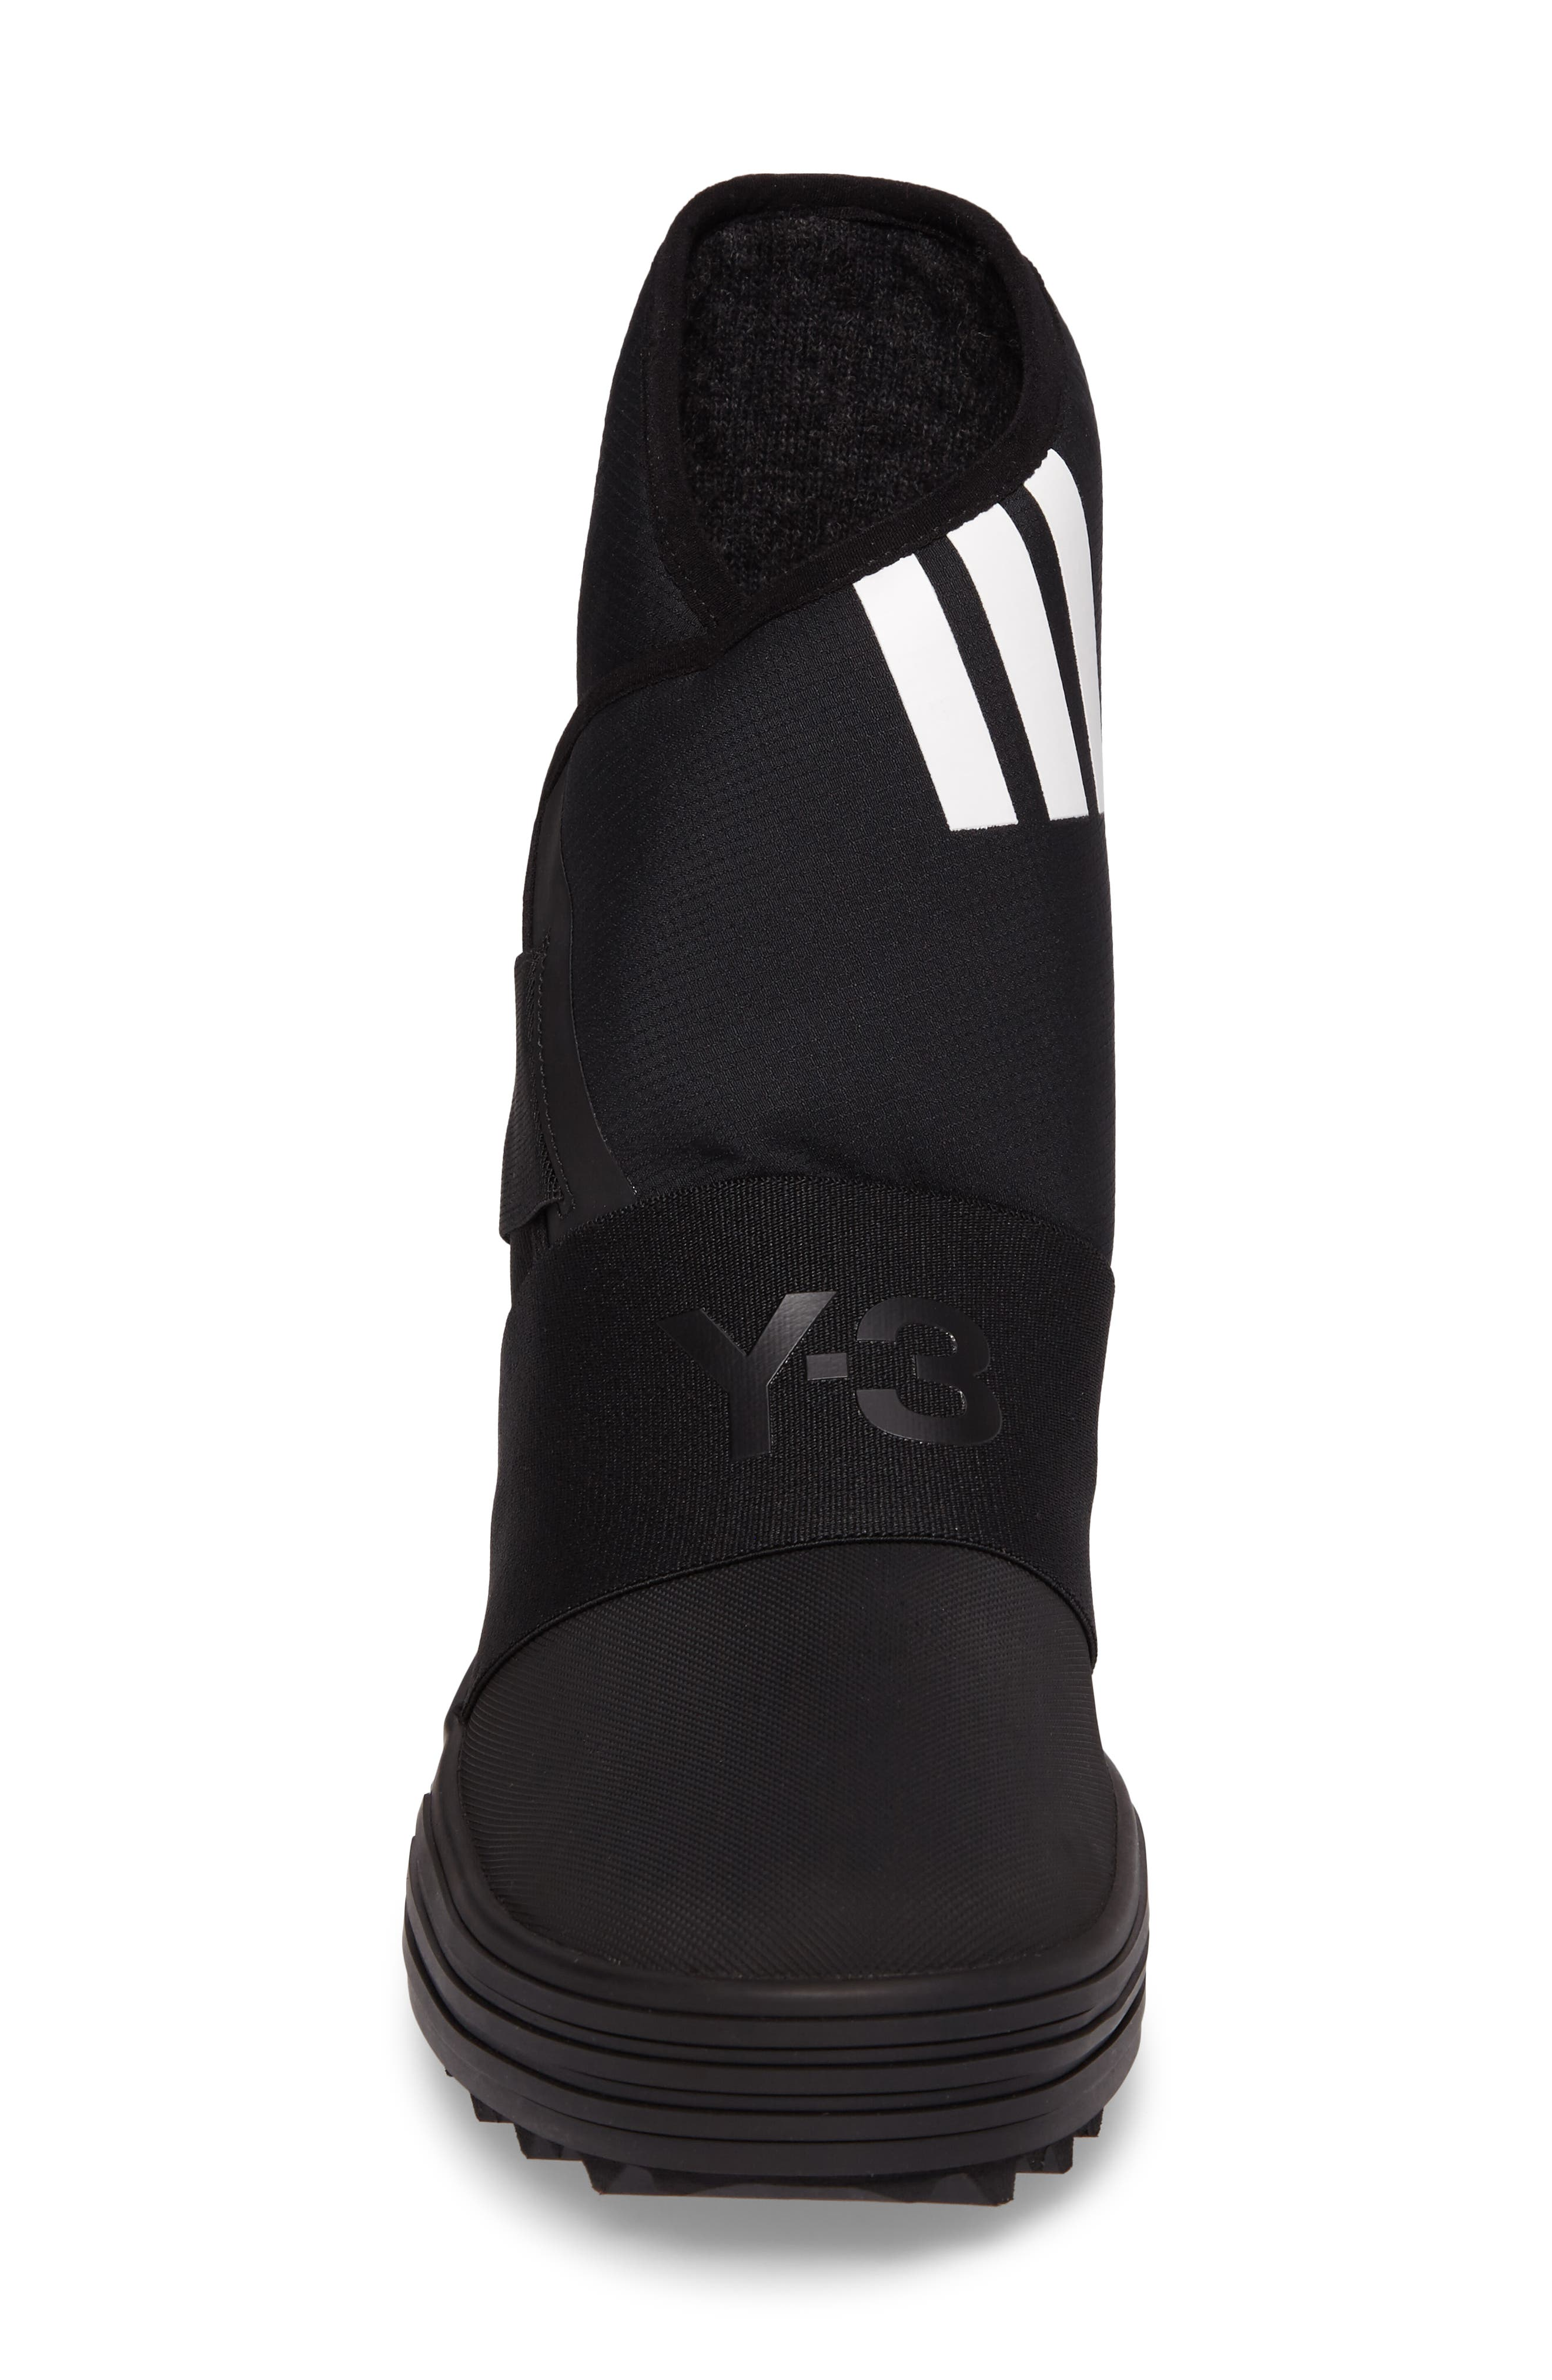 Sno Foxing High Top Sneaker,                             Alternate thumbnail 4, color,                             001